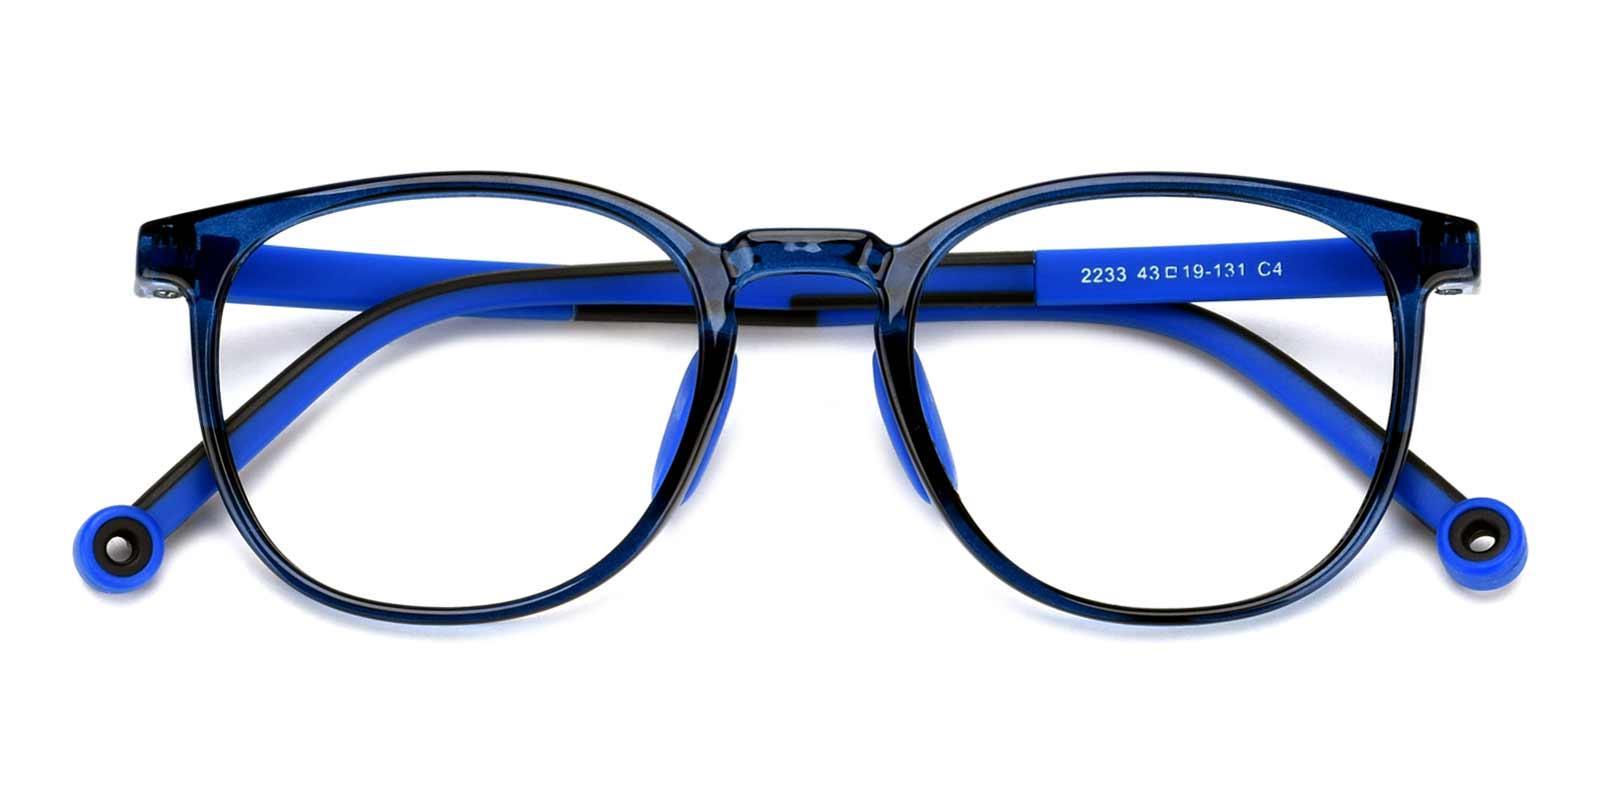 Jennifer-Blue-Round-Plastic-Eyeglasses-detail